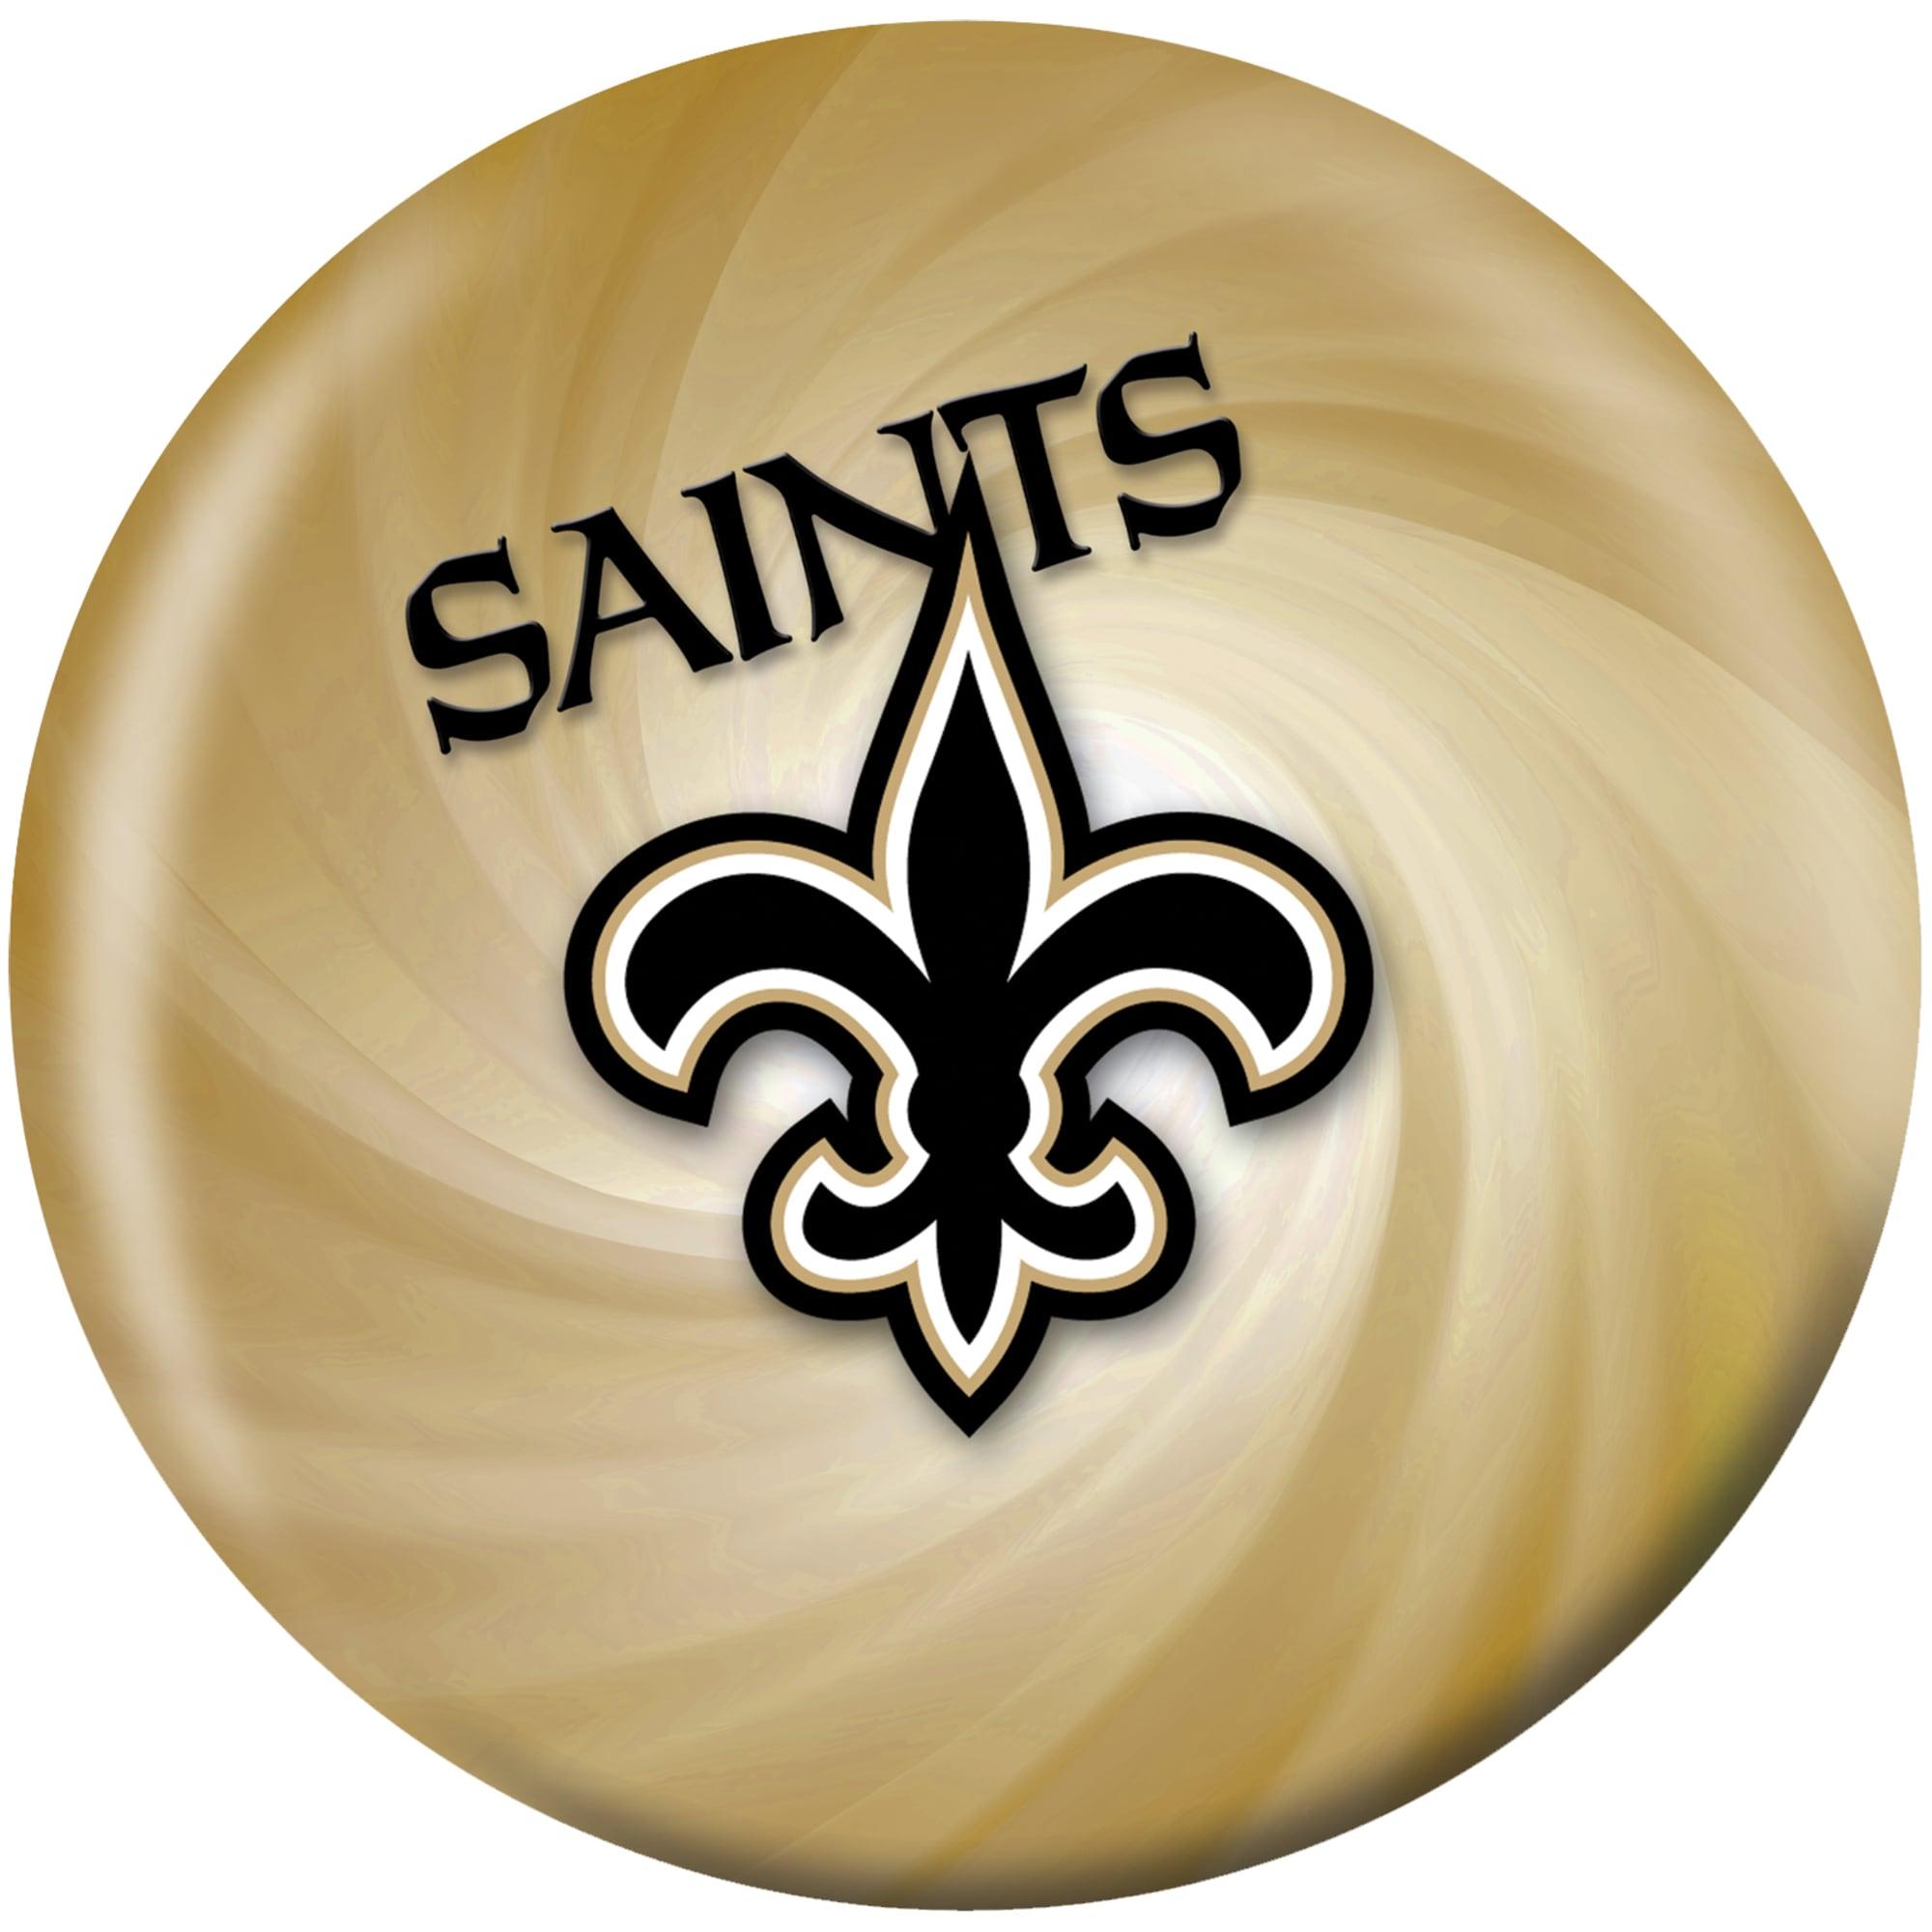 New Orleans Saints Bowling Ball